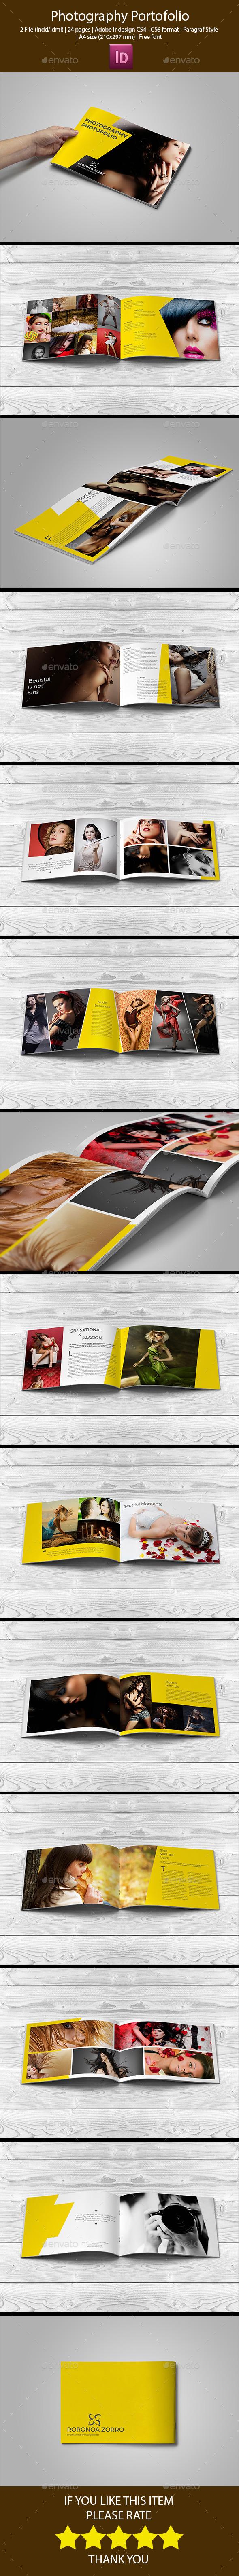 GraphicRiver Modern Photography Portofolio 10688491